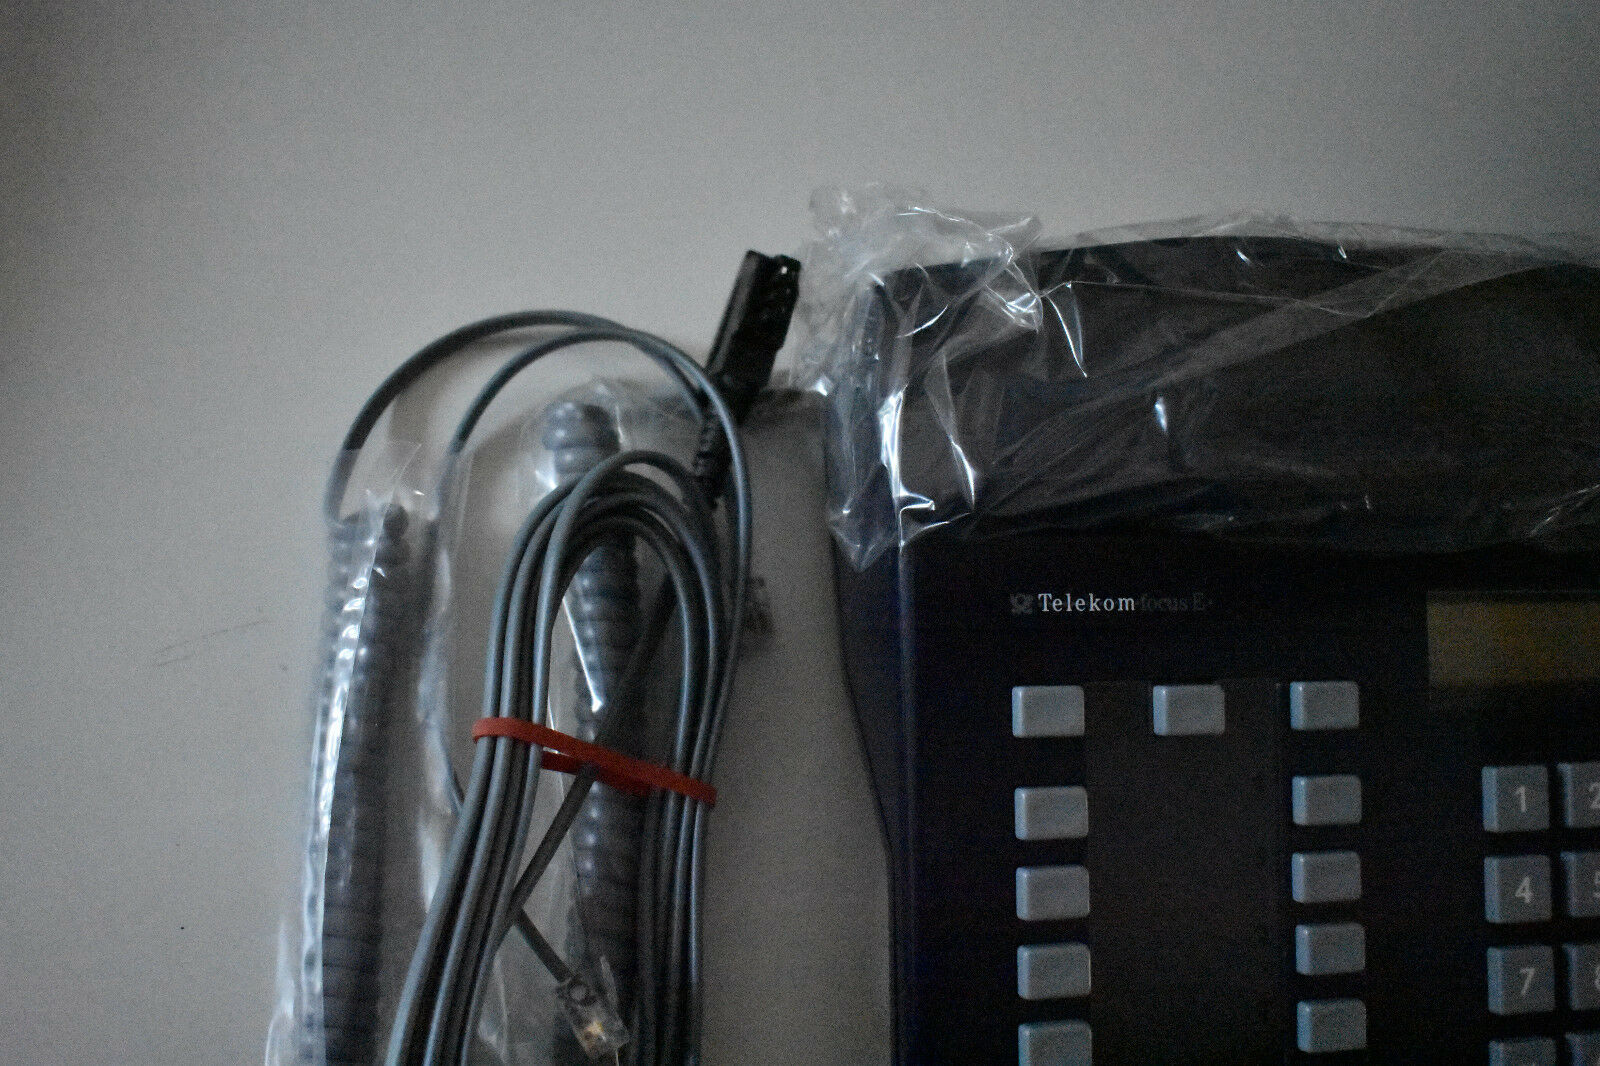 Telekom T-Com Octopus E Octophon E 20 schwarz Systemtelefon Re/_MwSt Telefon E20